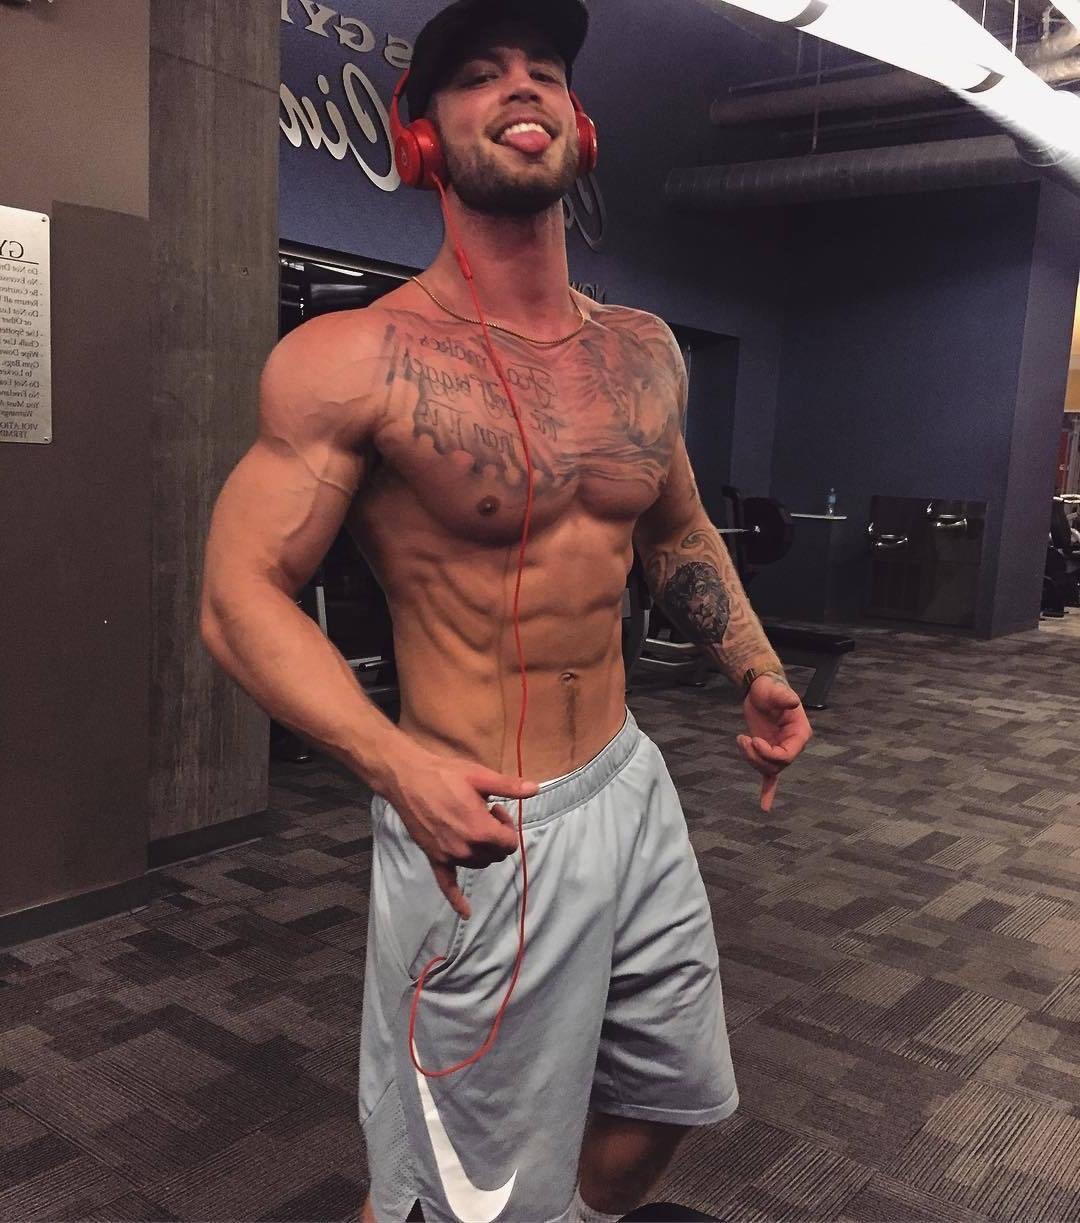 beefy-frat-jock-college-bro-baller-shorts-shirtless-muscle-pecs-biceps-sexy-mad-smile-cap